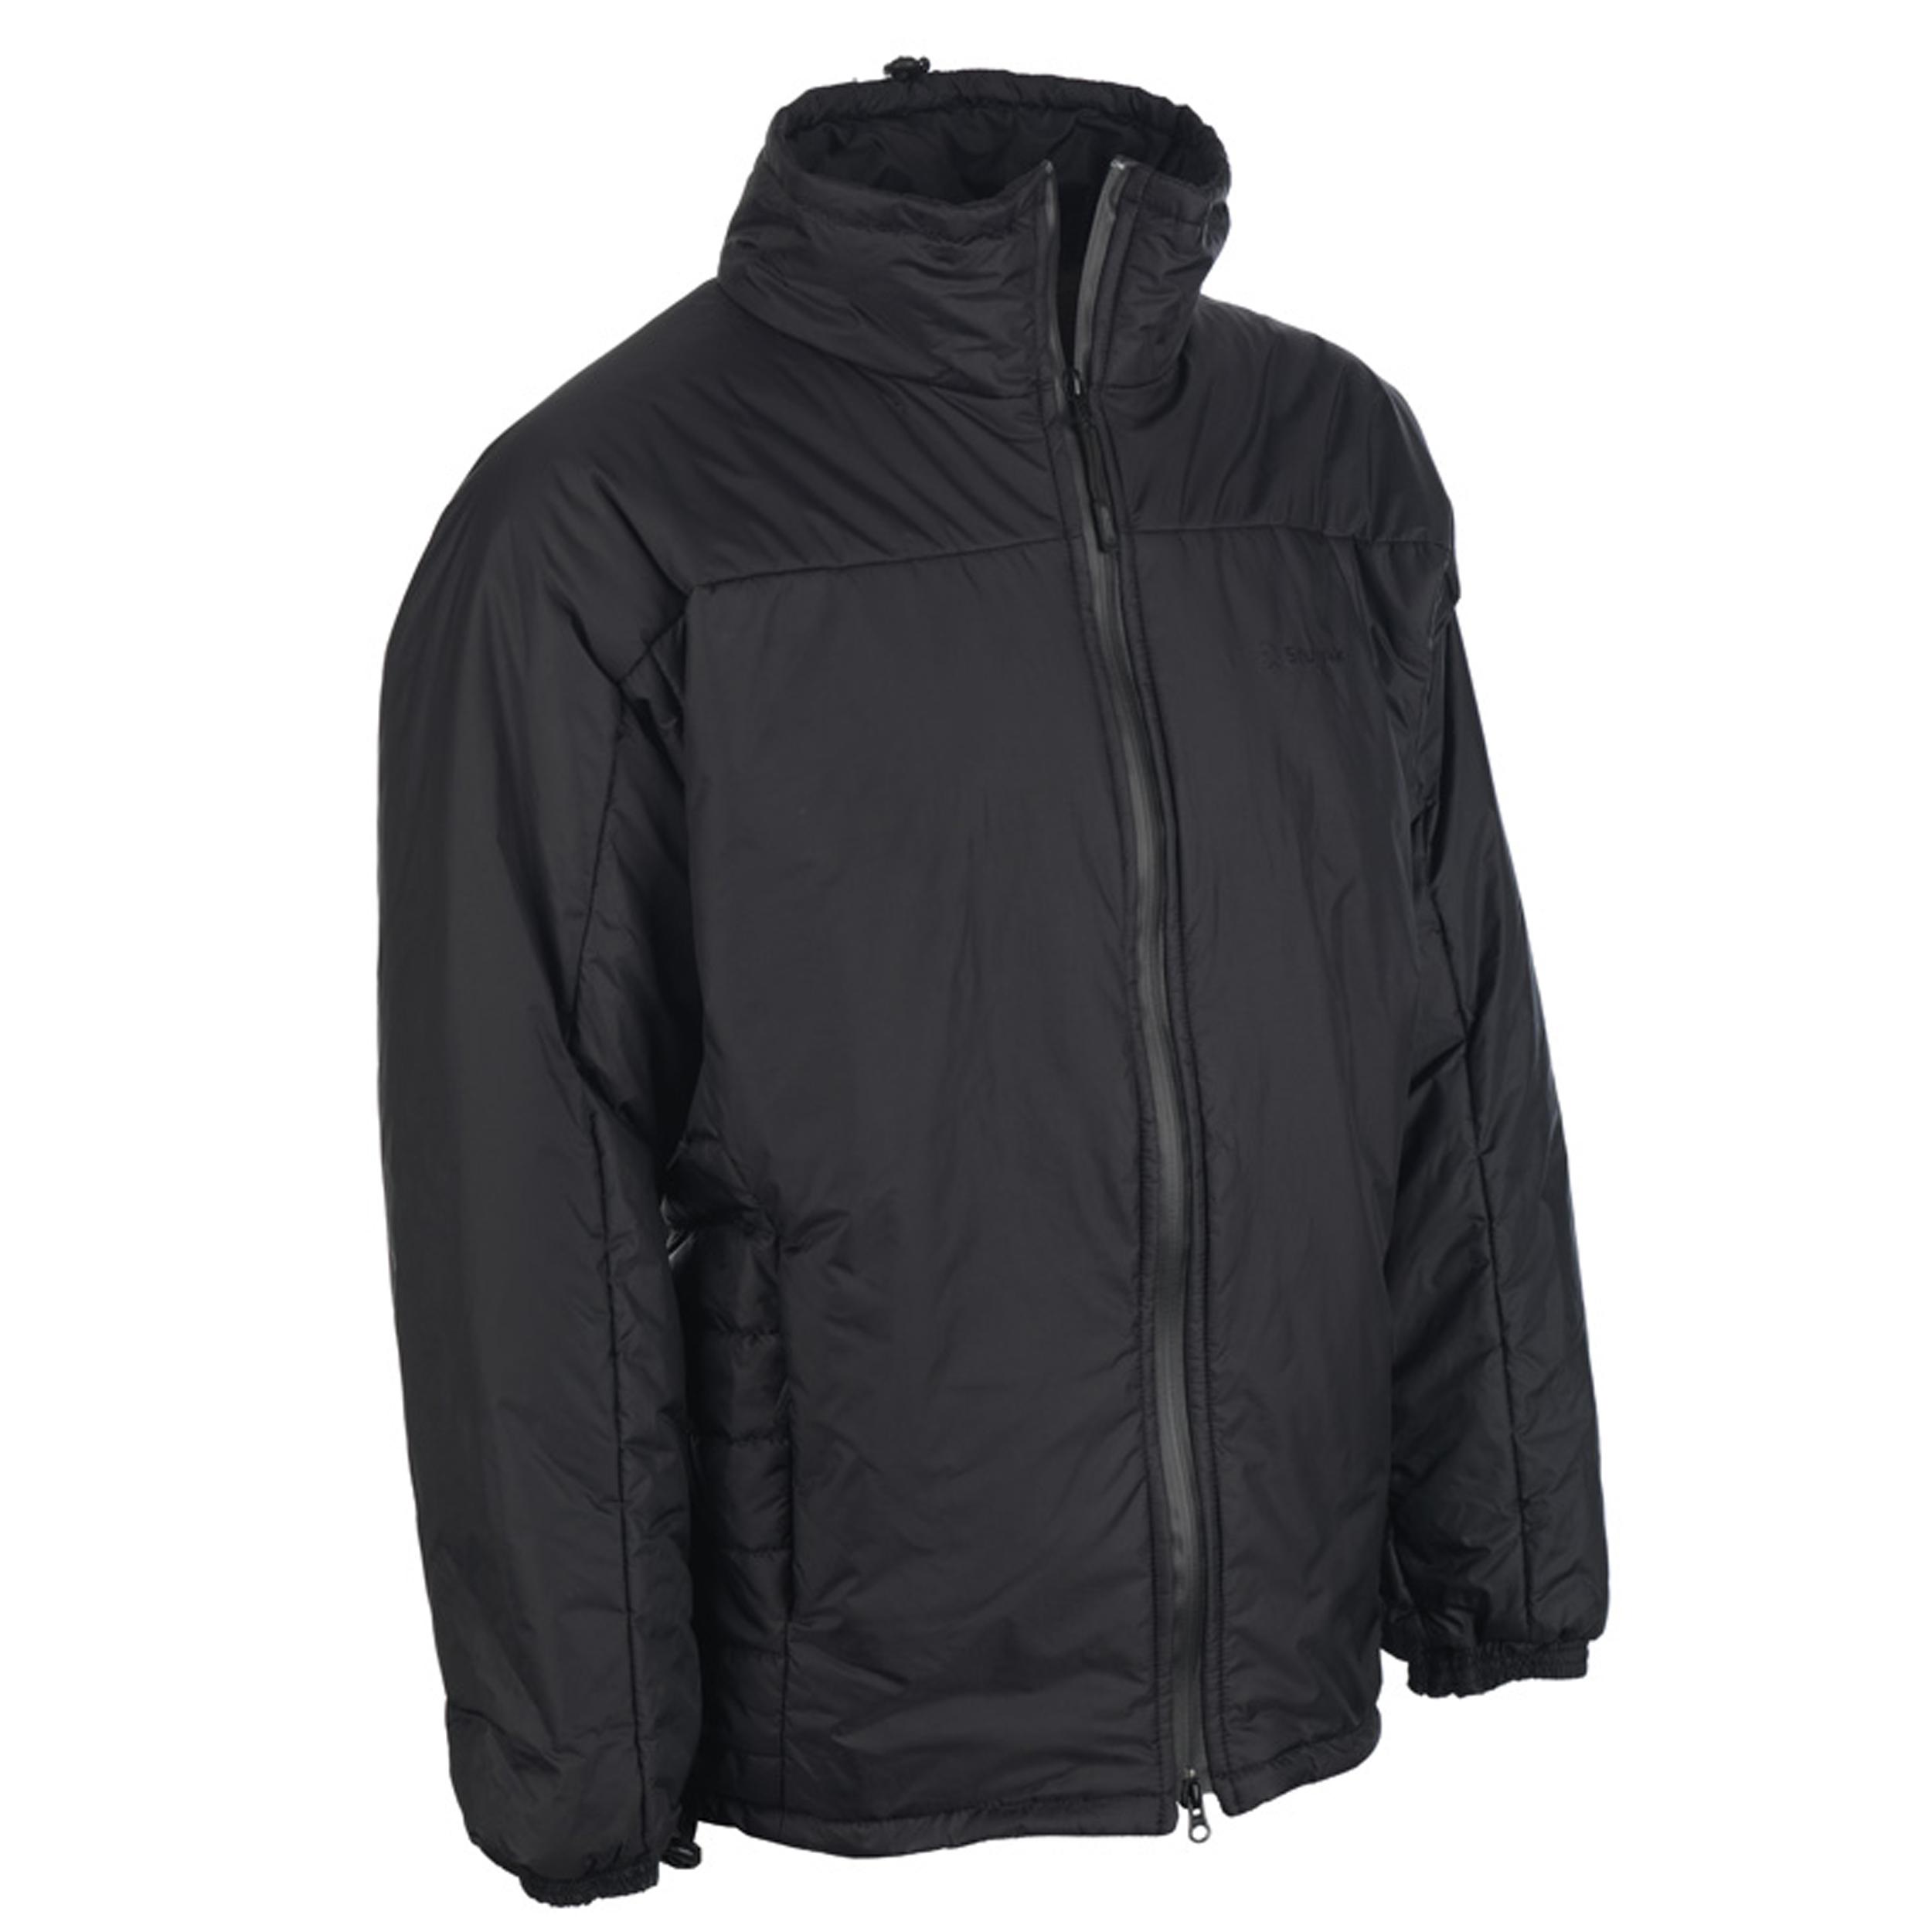 Snugpak Sj6 Jacket Black Xxl